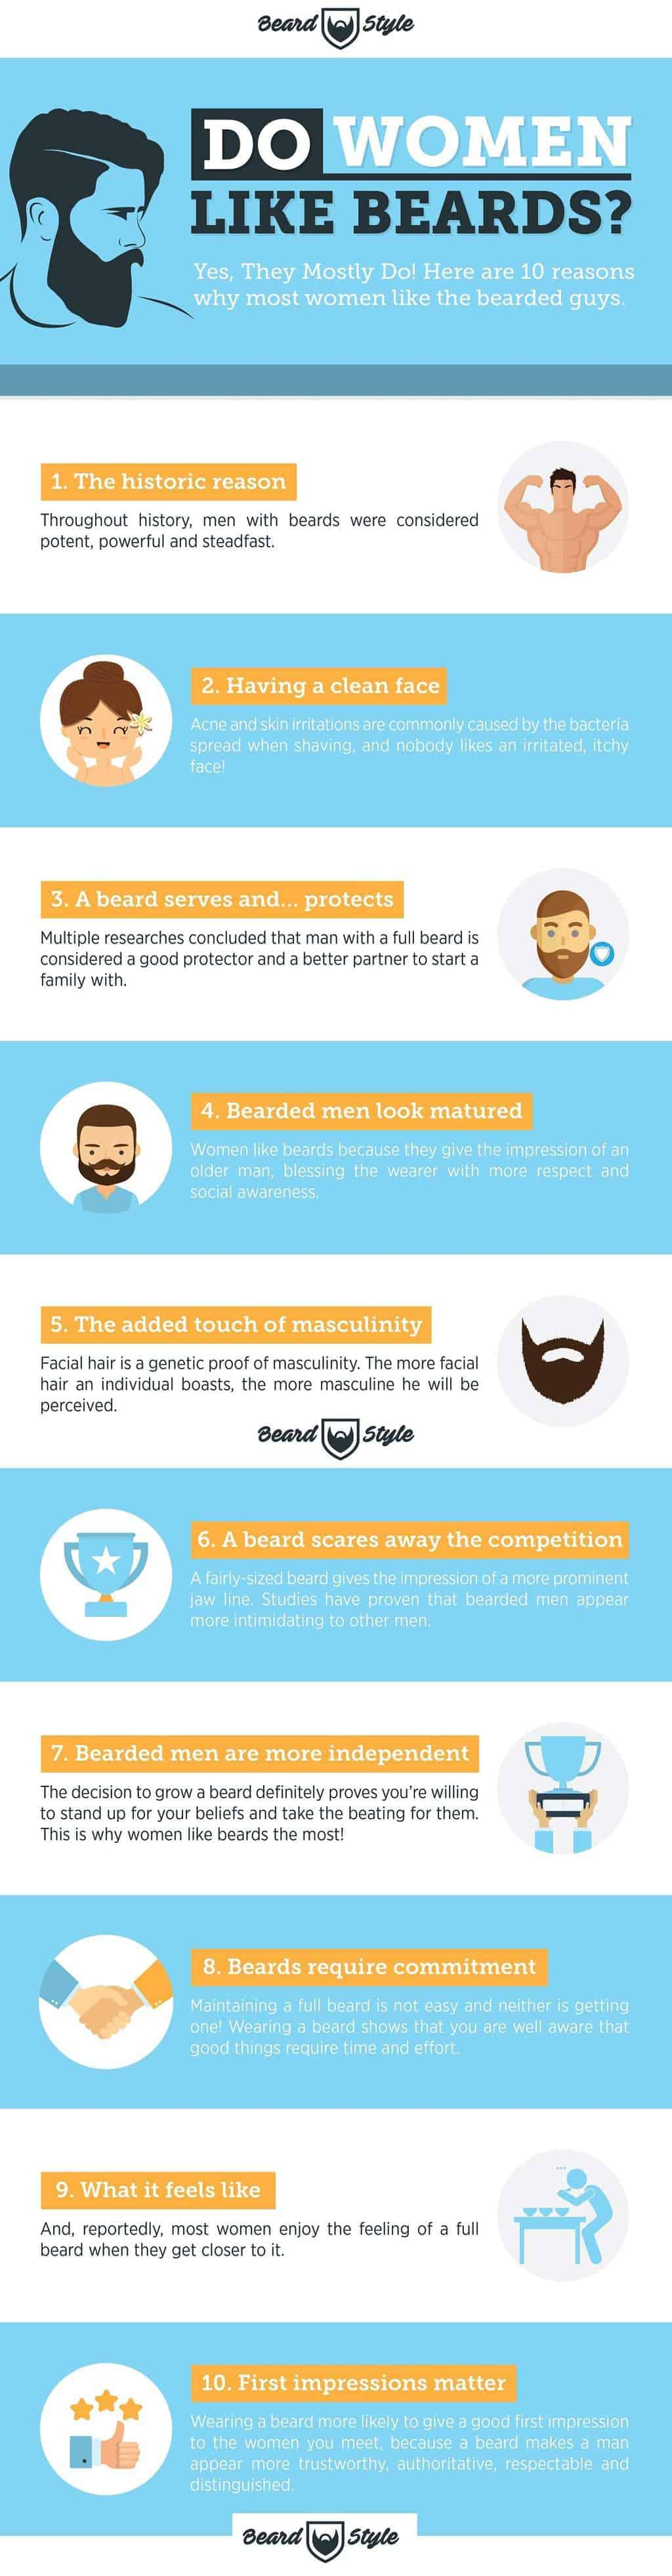 Do-women-like-beard-infographic-min 10 Reasons Why Women Like Beards [With Infographic]